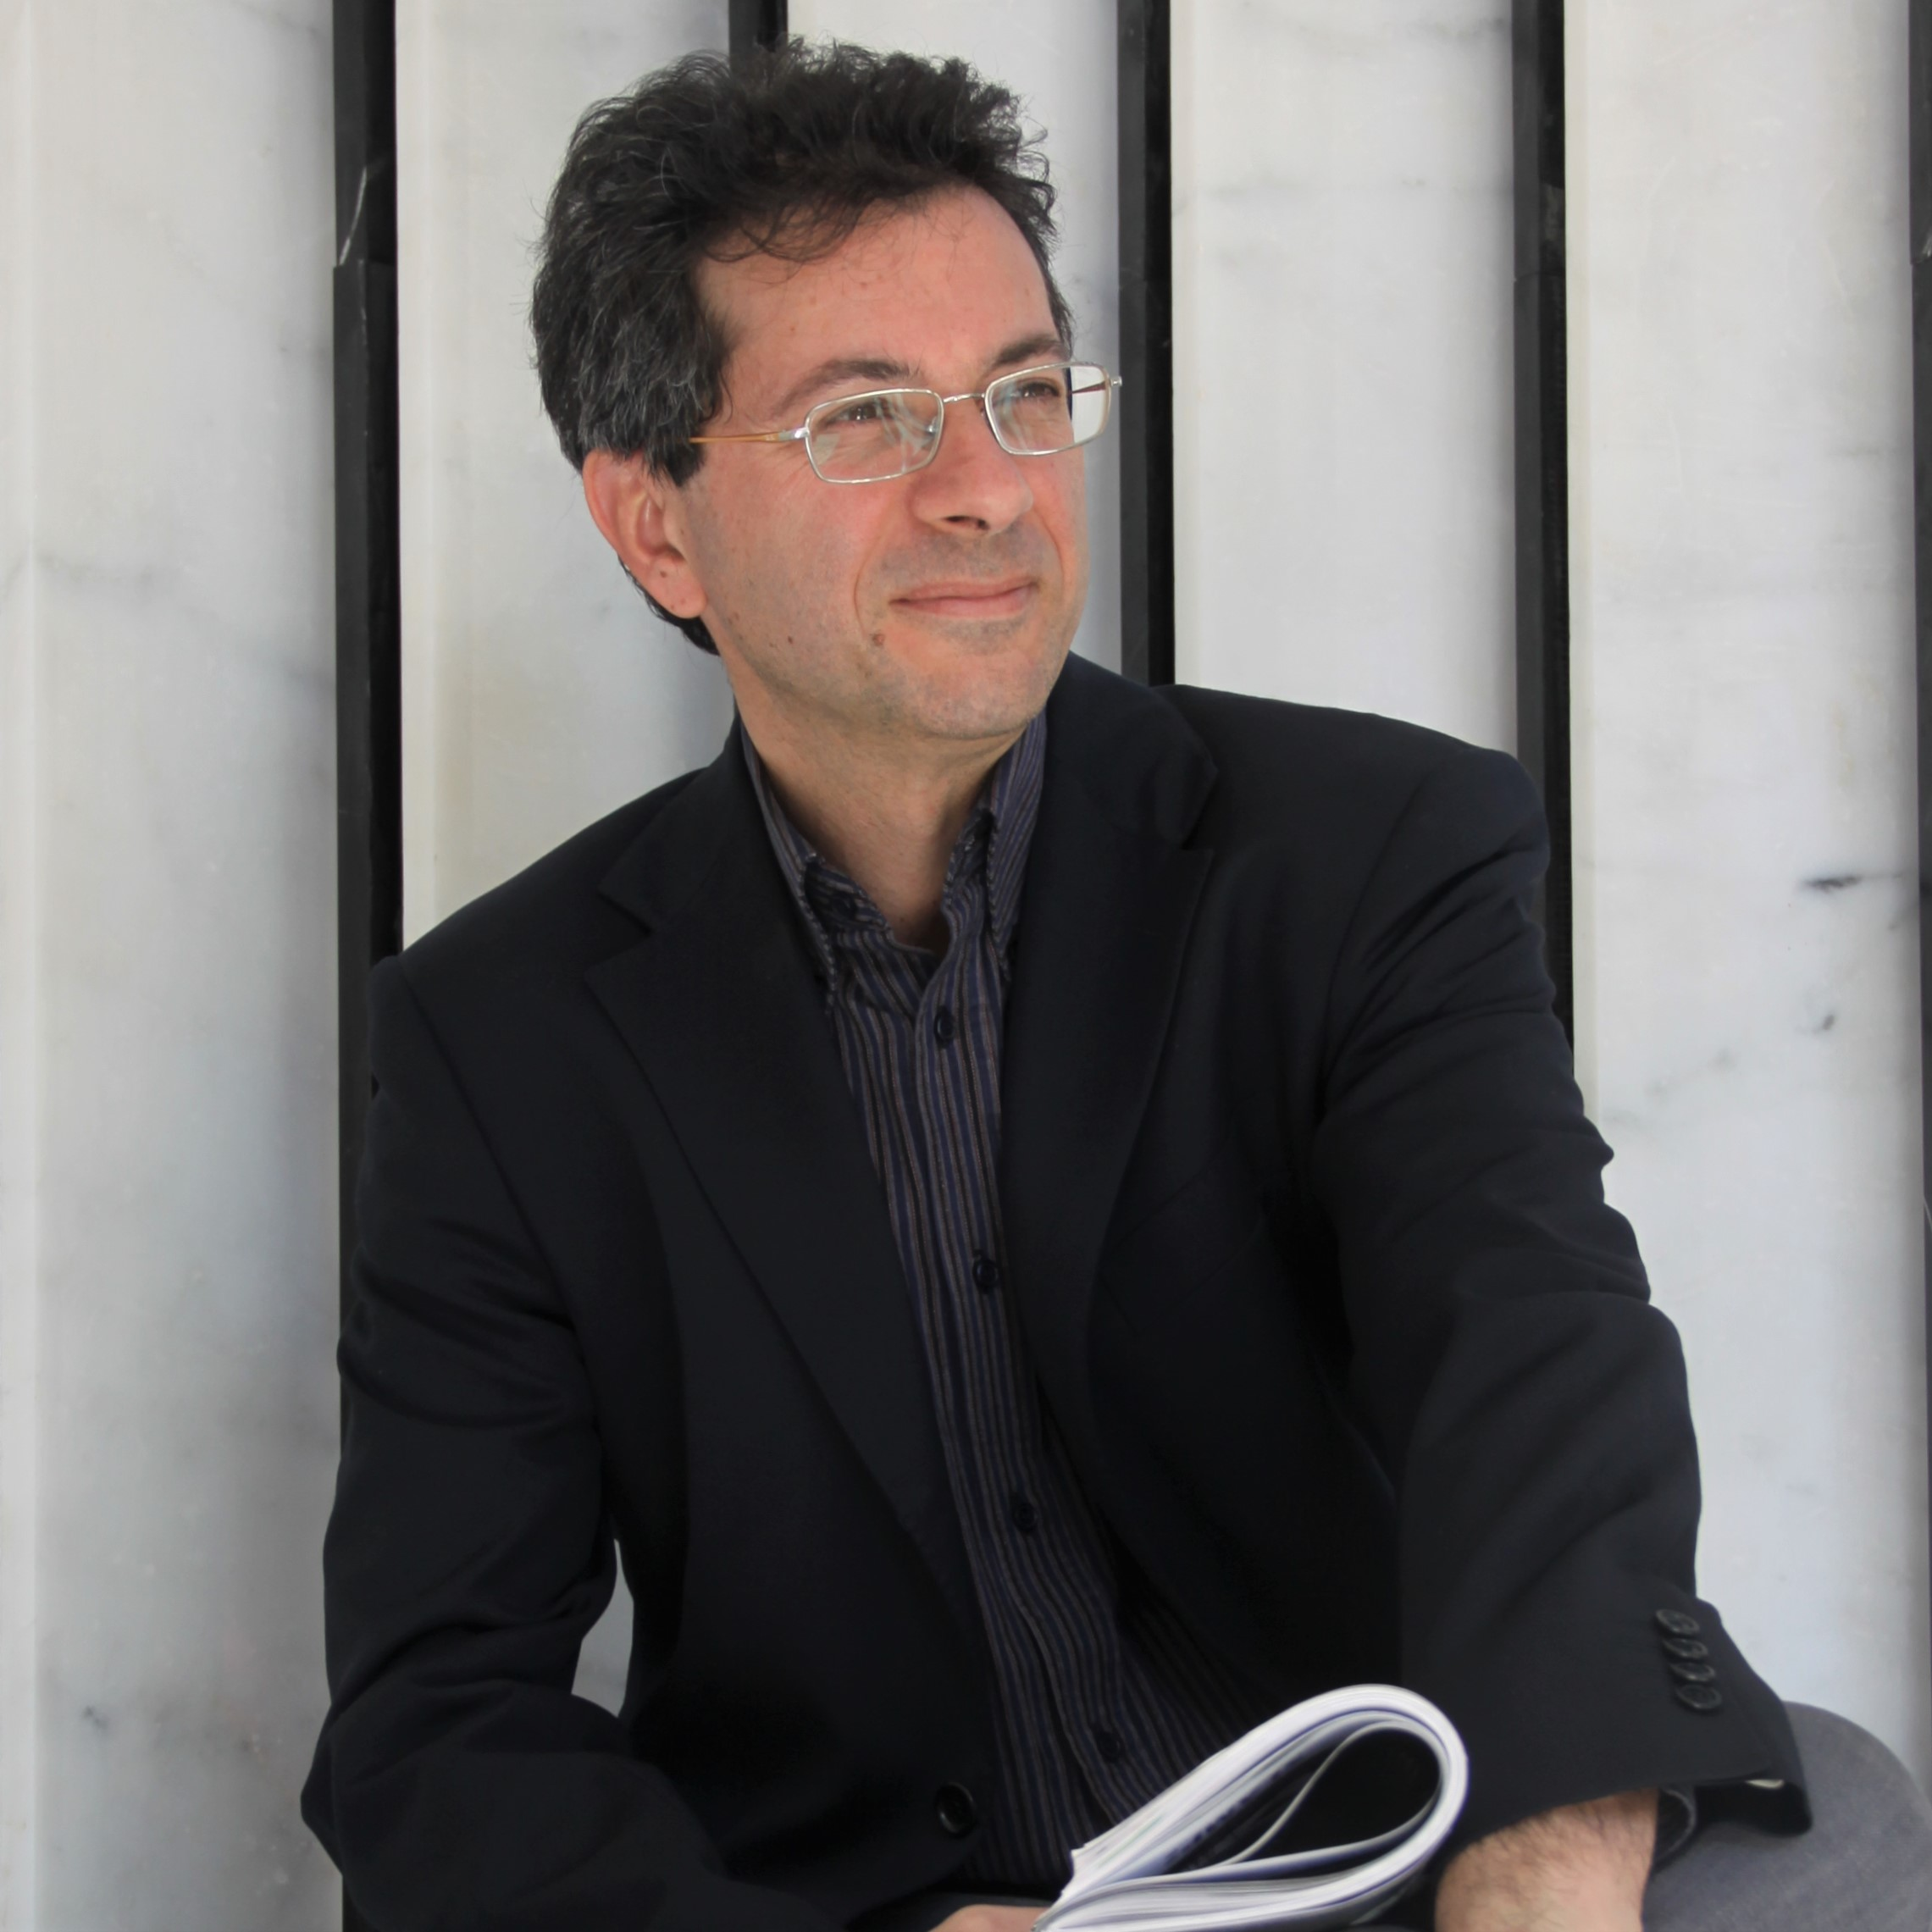 Luigi Corato